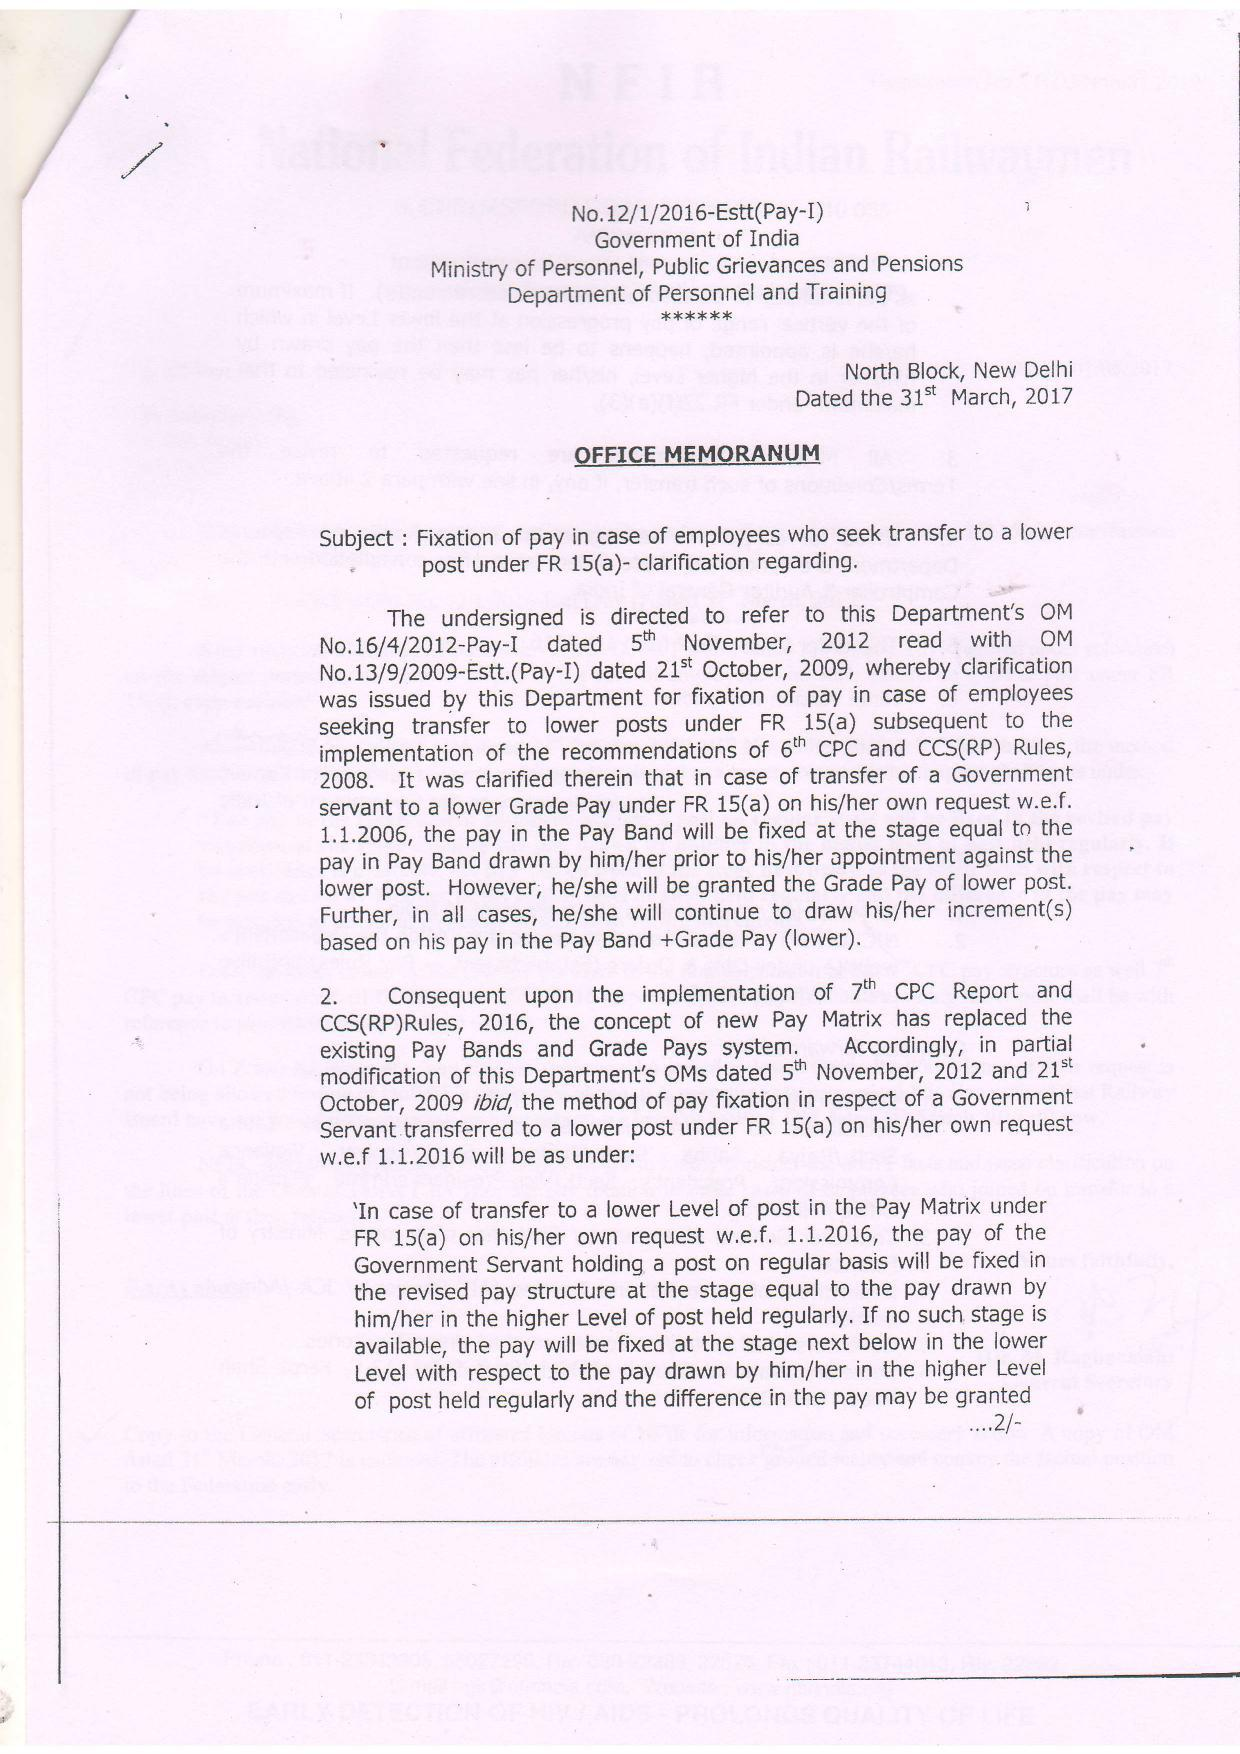 NFIR clarification regarding pay fixation